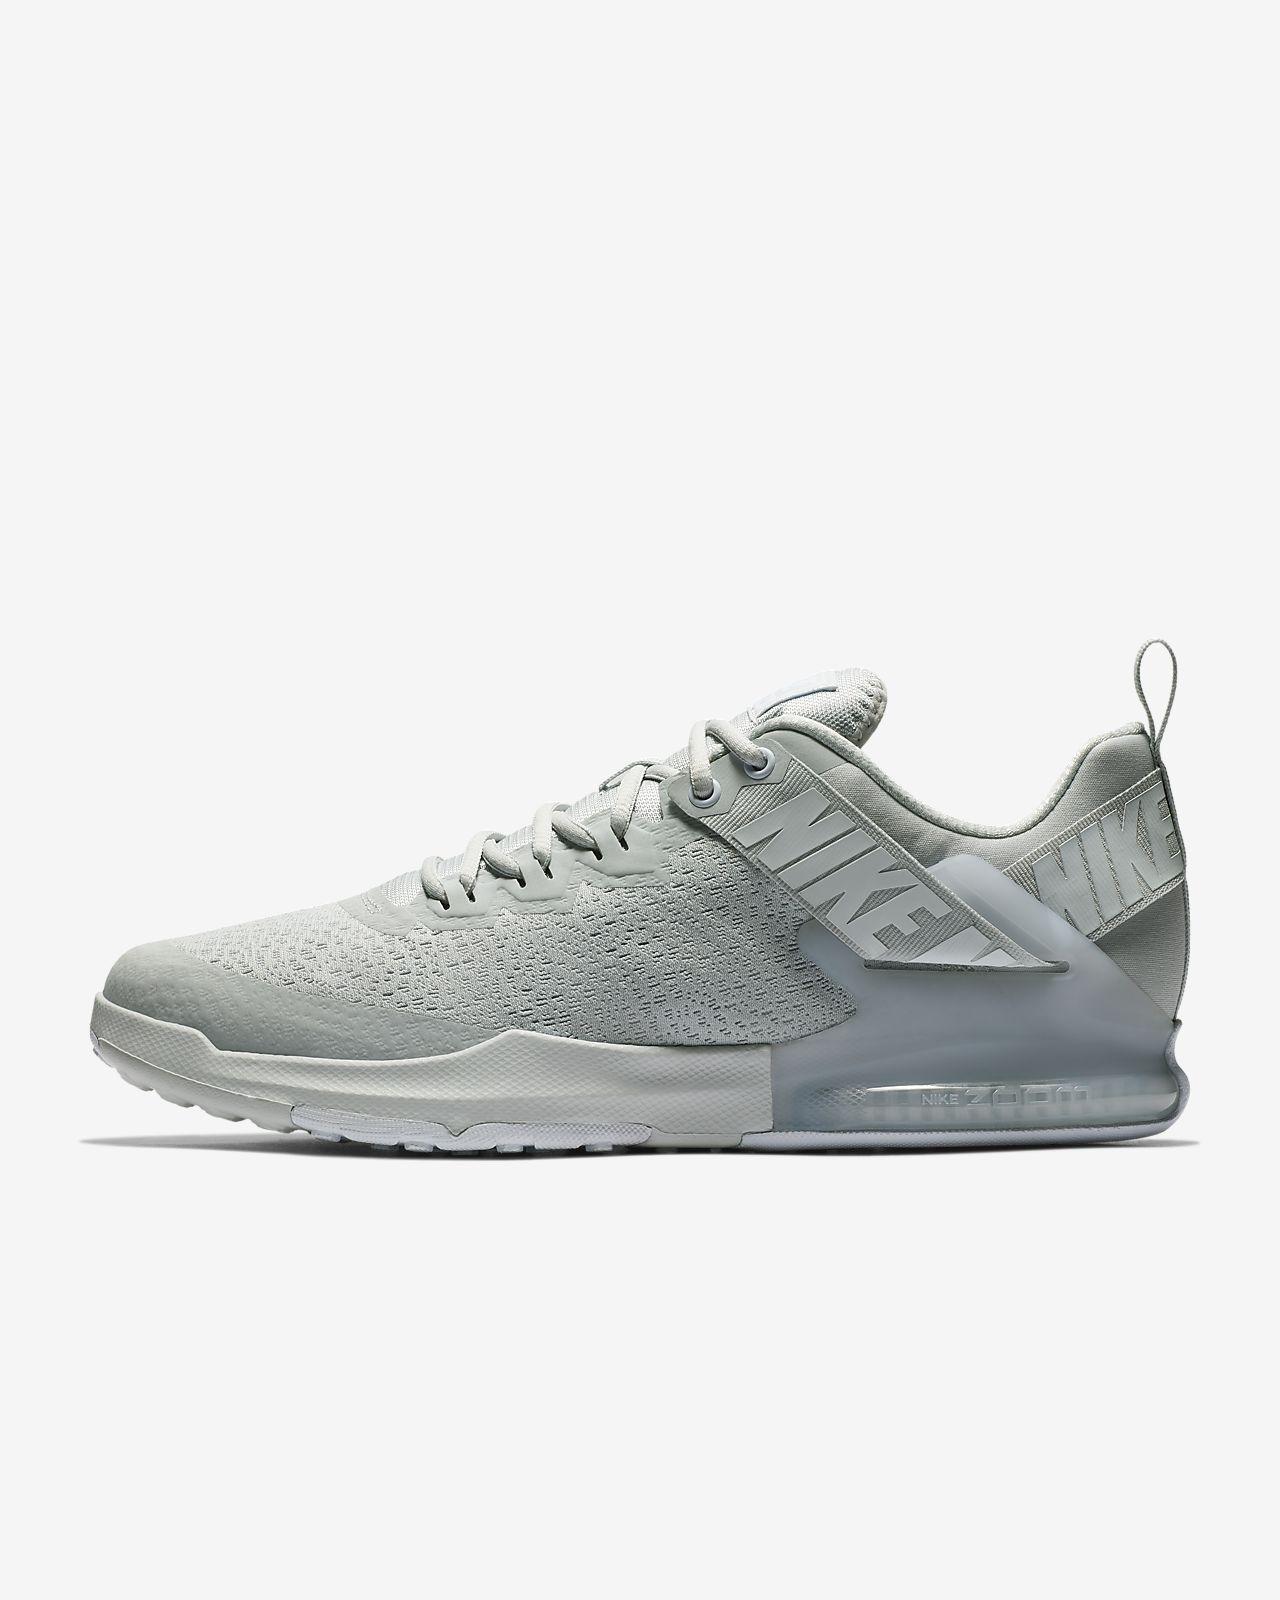 d1f0a3ba4a8fa ireland white green mens nike free tr2 shoes 3055a 1c686